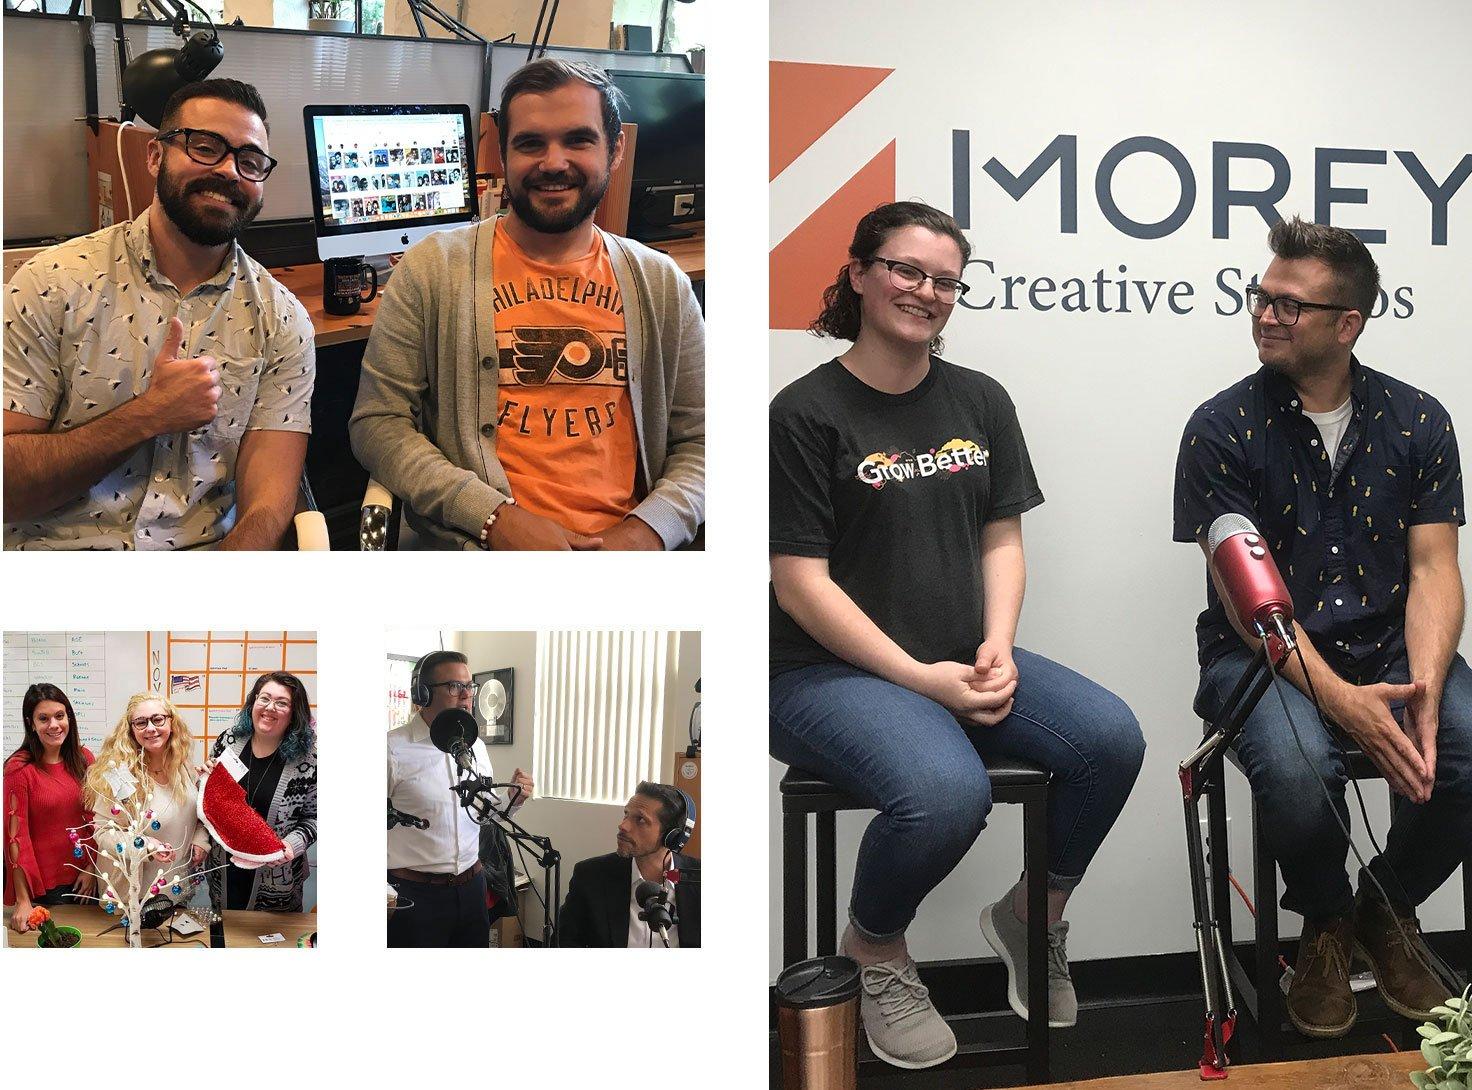 Morey Creative Studios Team